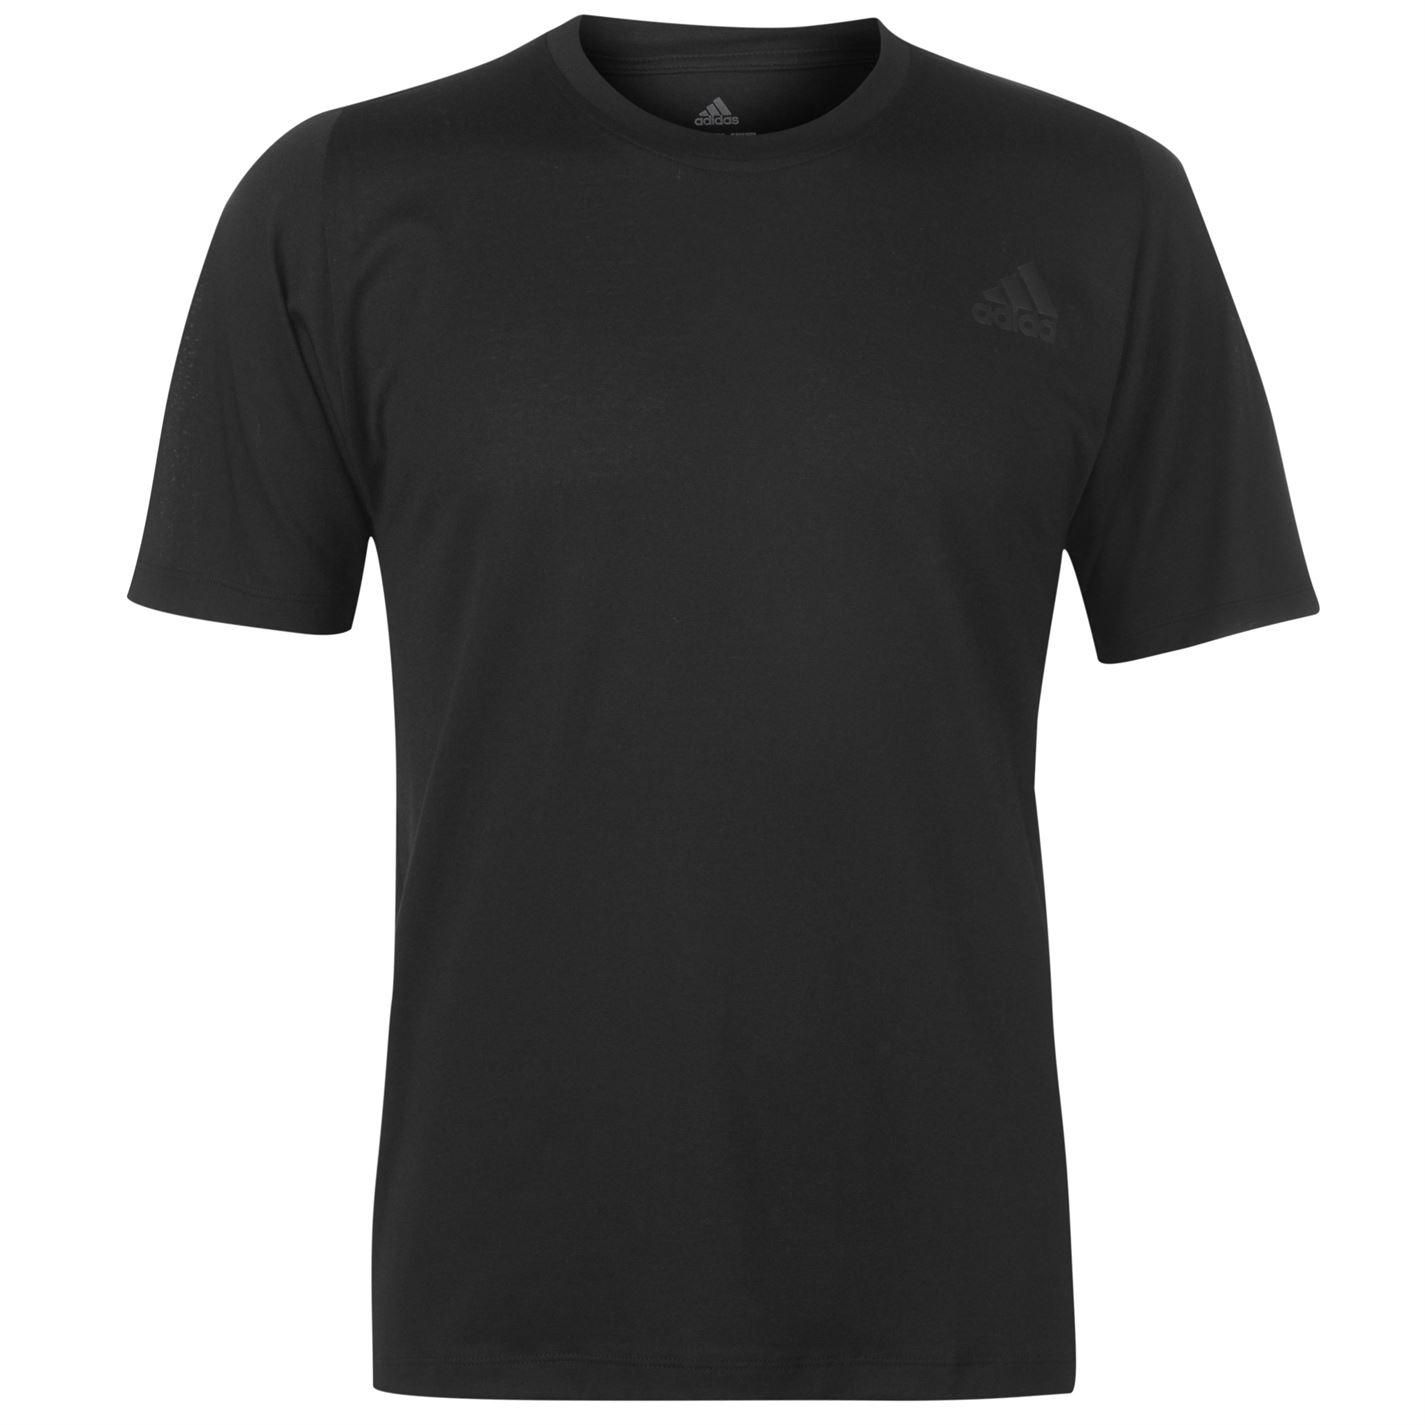 Adidas Prime T Shirt Mens